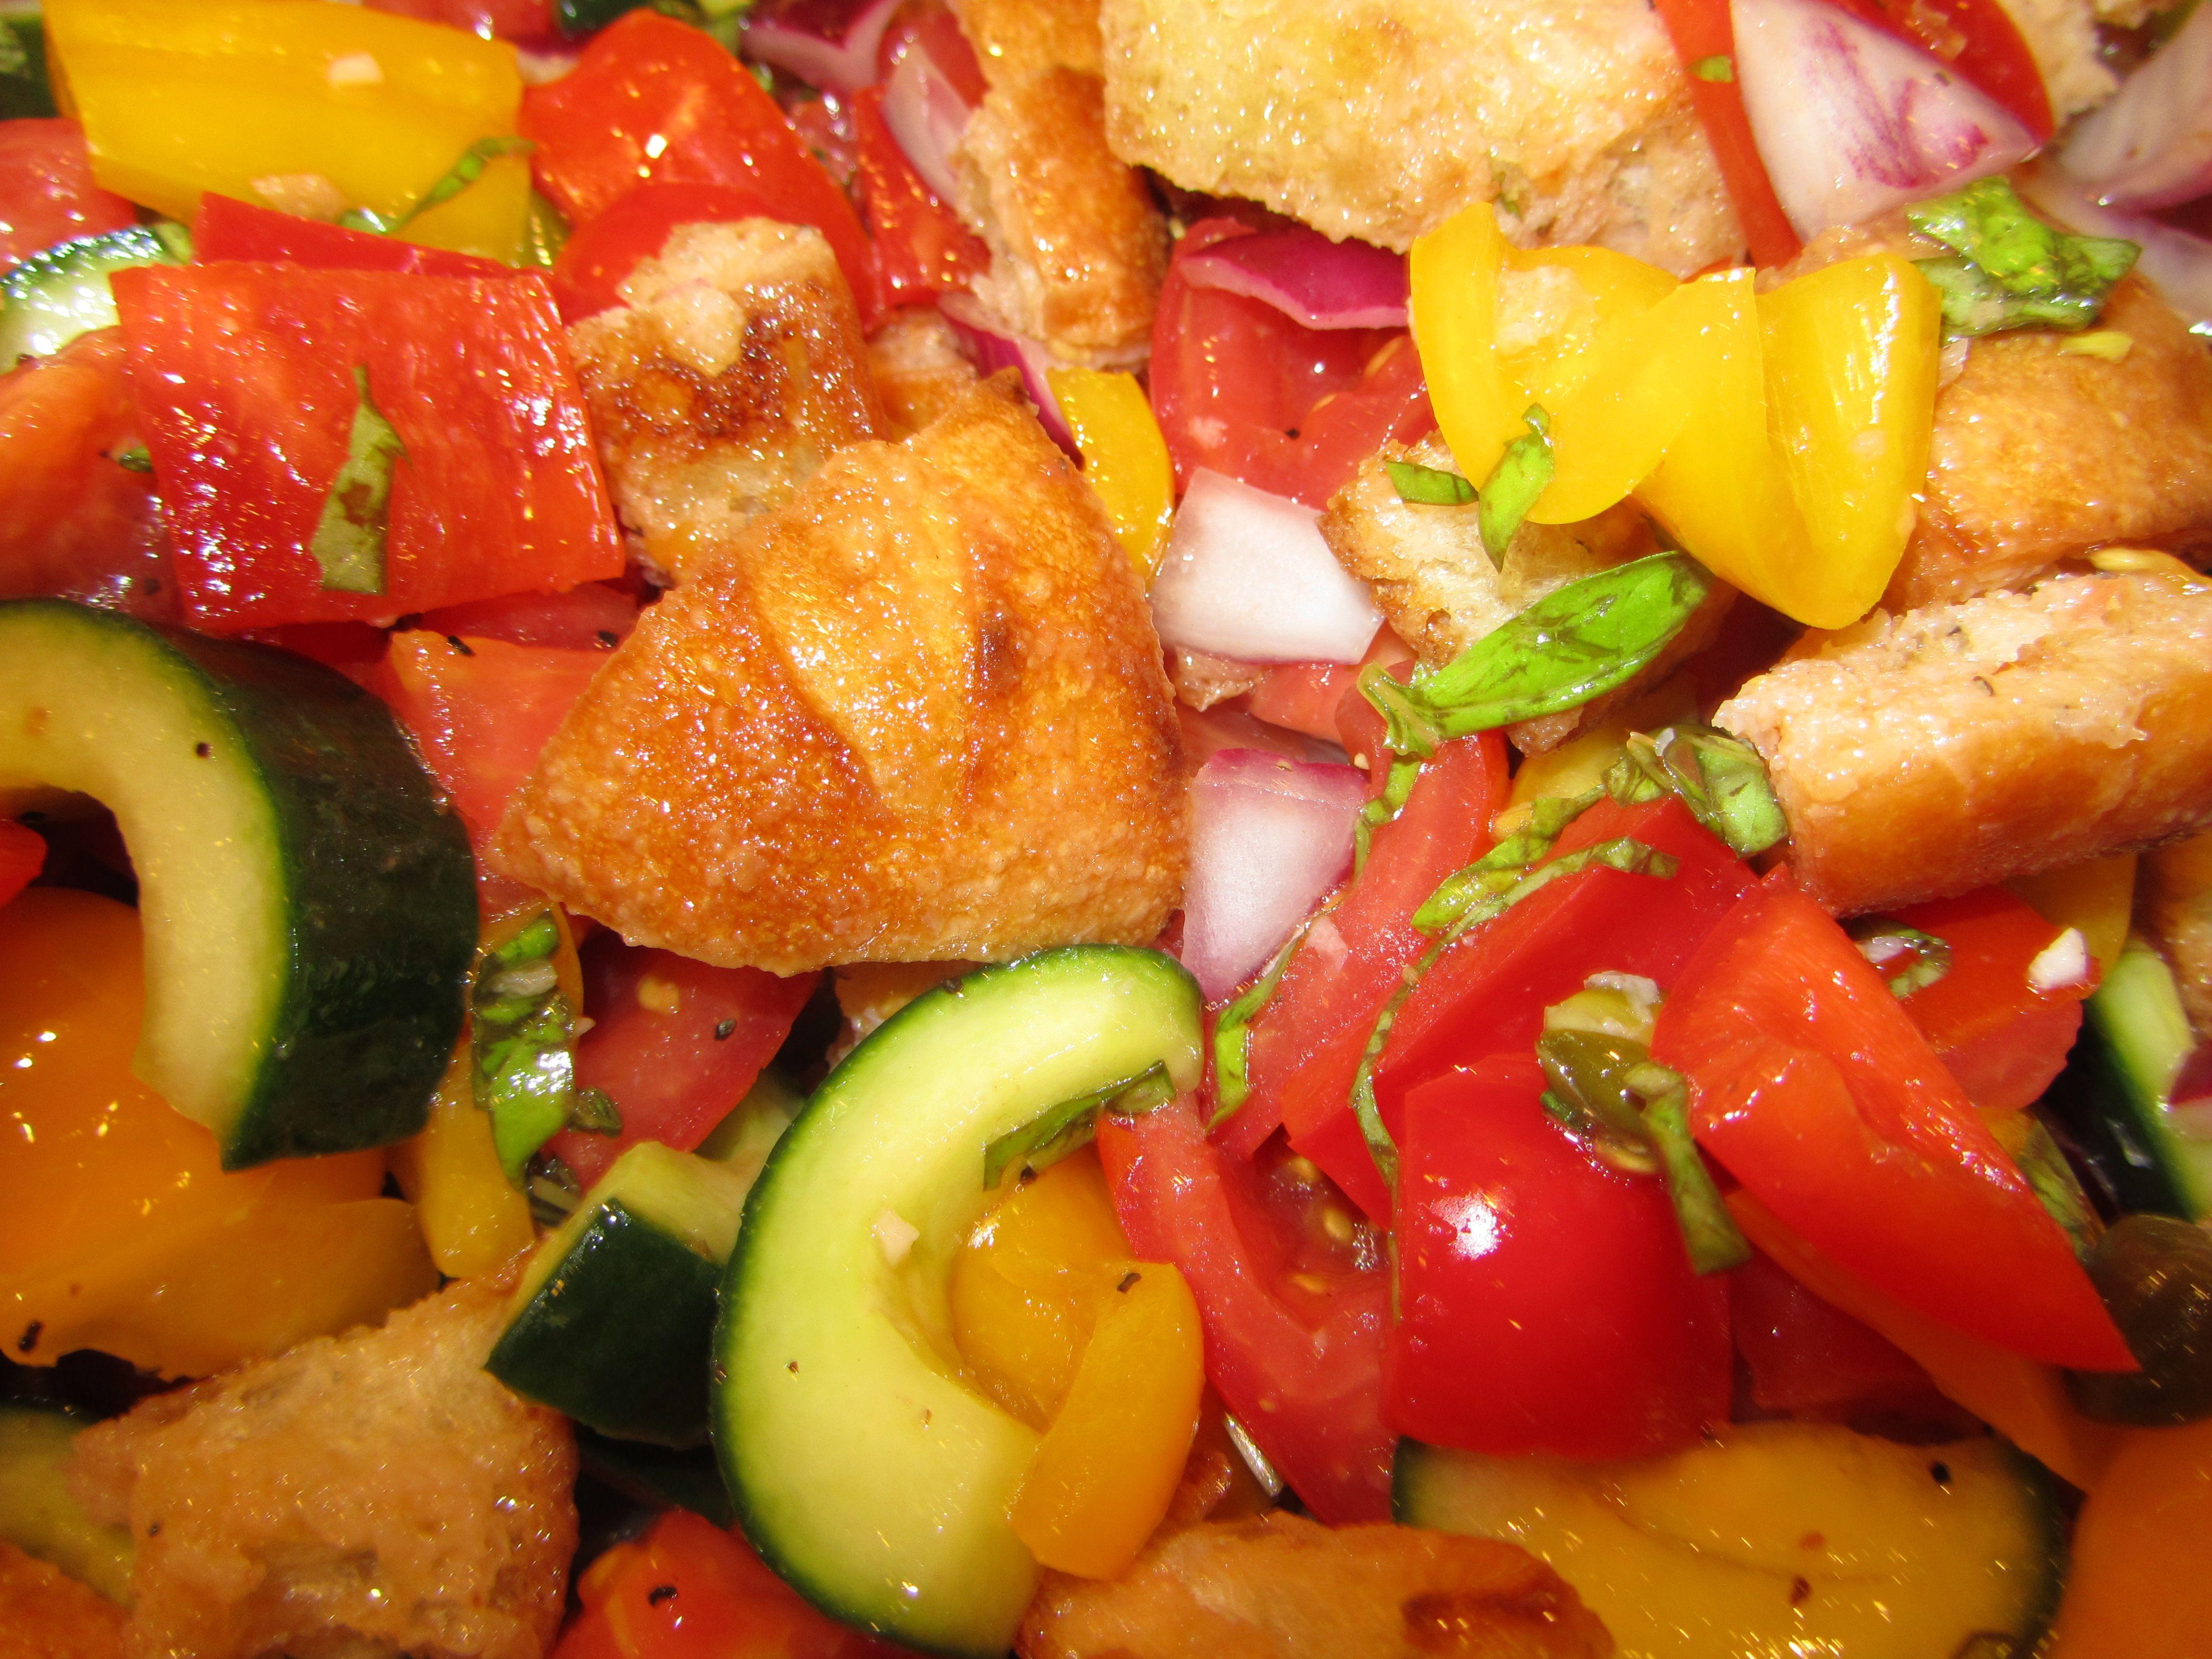 Barefoot Contessa Panzanella Salad Recipe